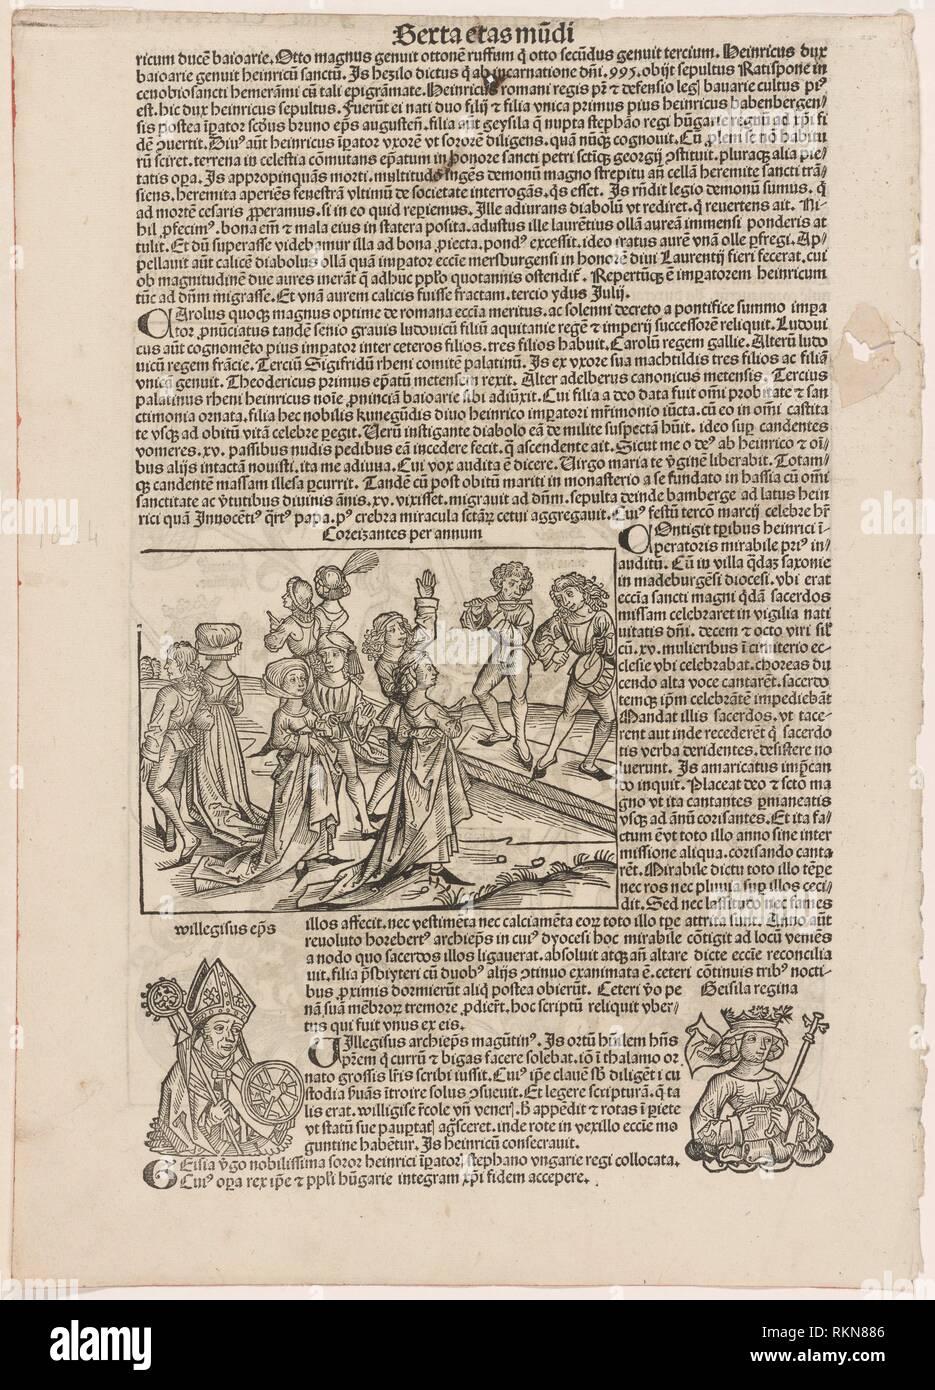 [Basse danse]. Schedel, Hartmann, 1440-1514 (Writer of accompanying material) Pleydenwurff, Wilhelm, d. 1494 (Illustrator) Wolgemut, Michael, - Stock Image